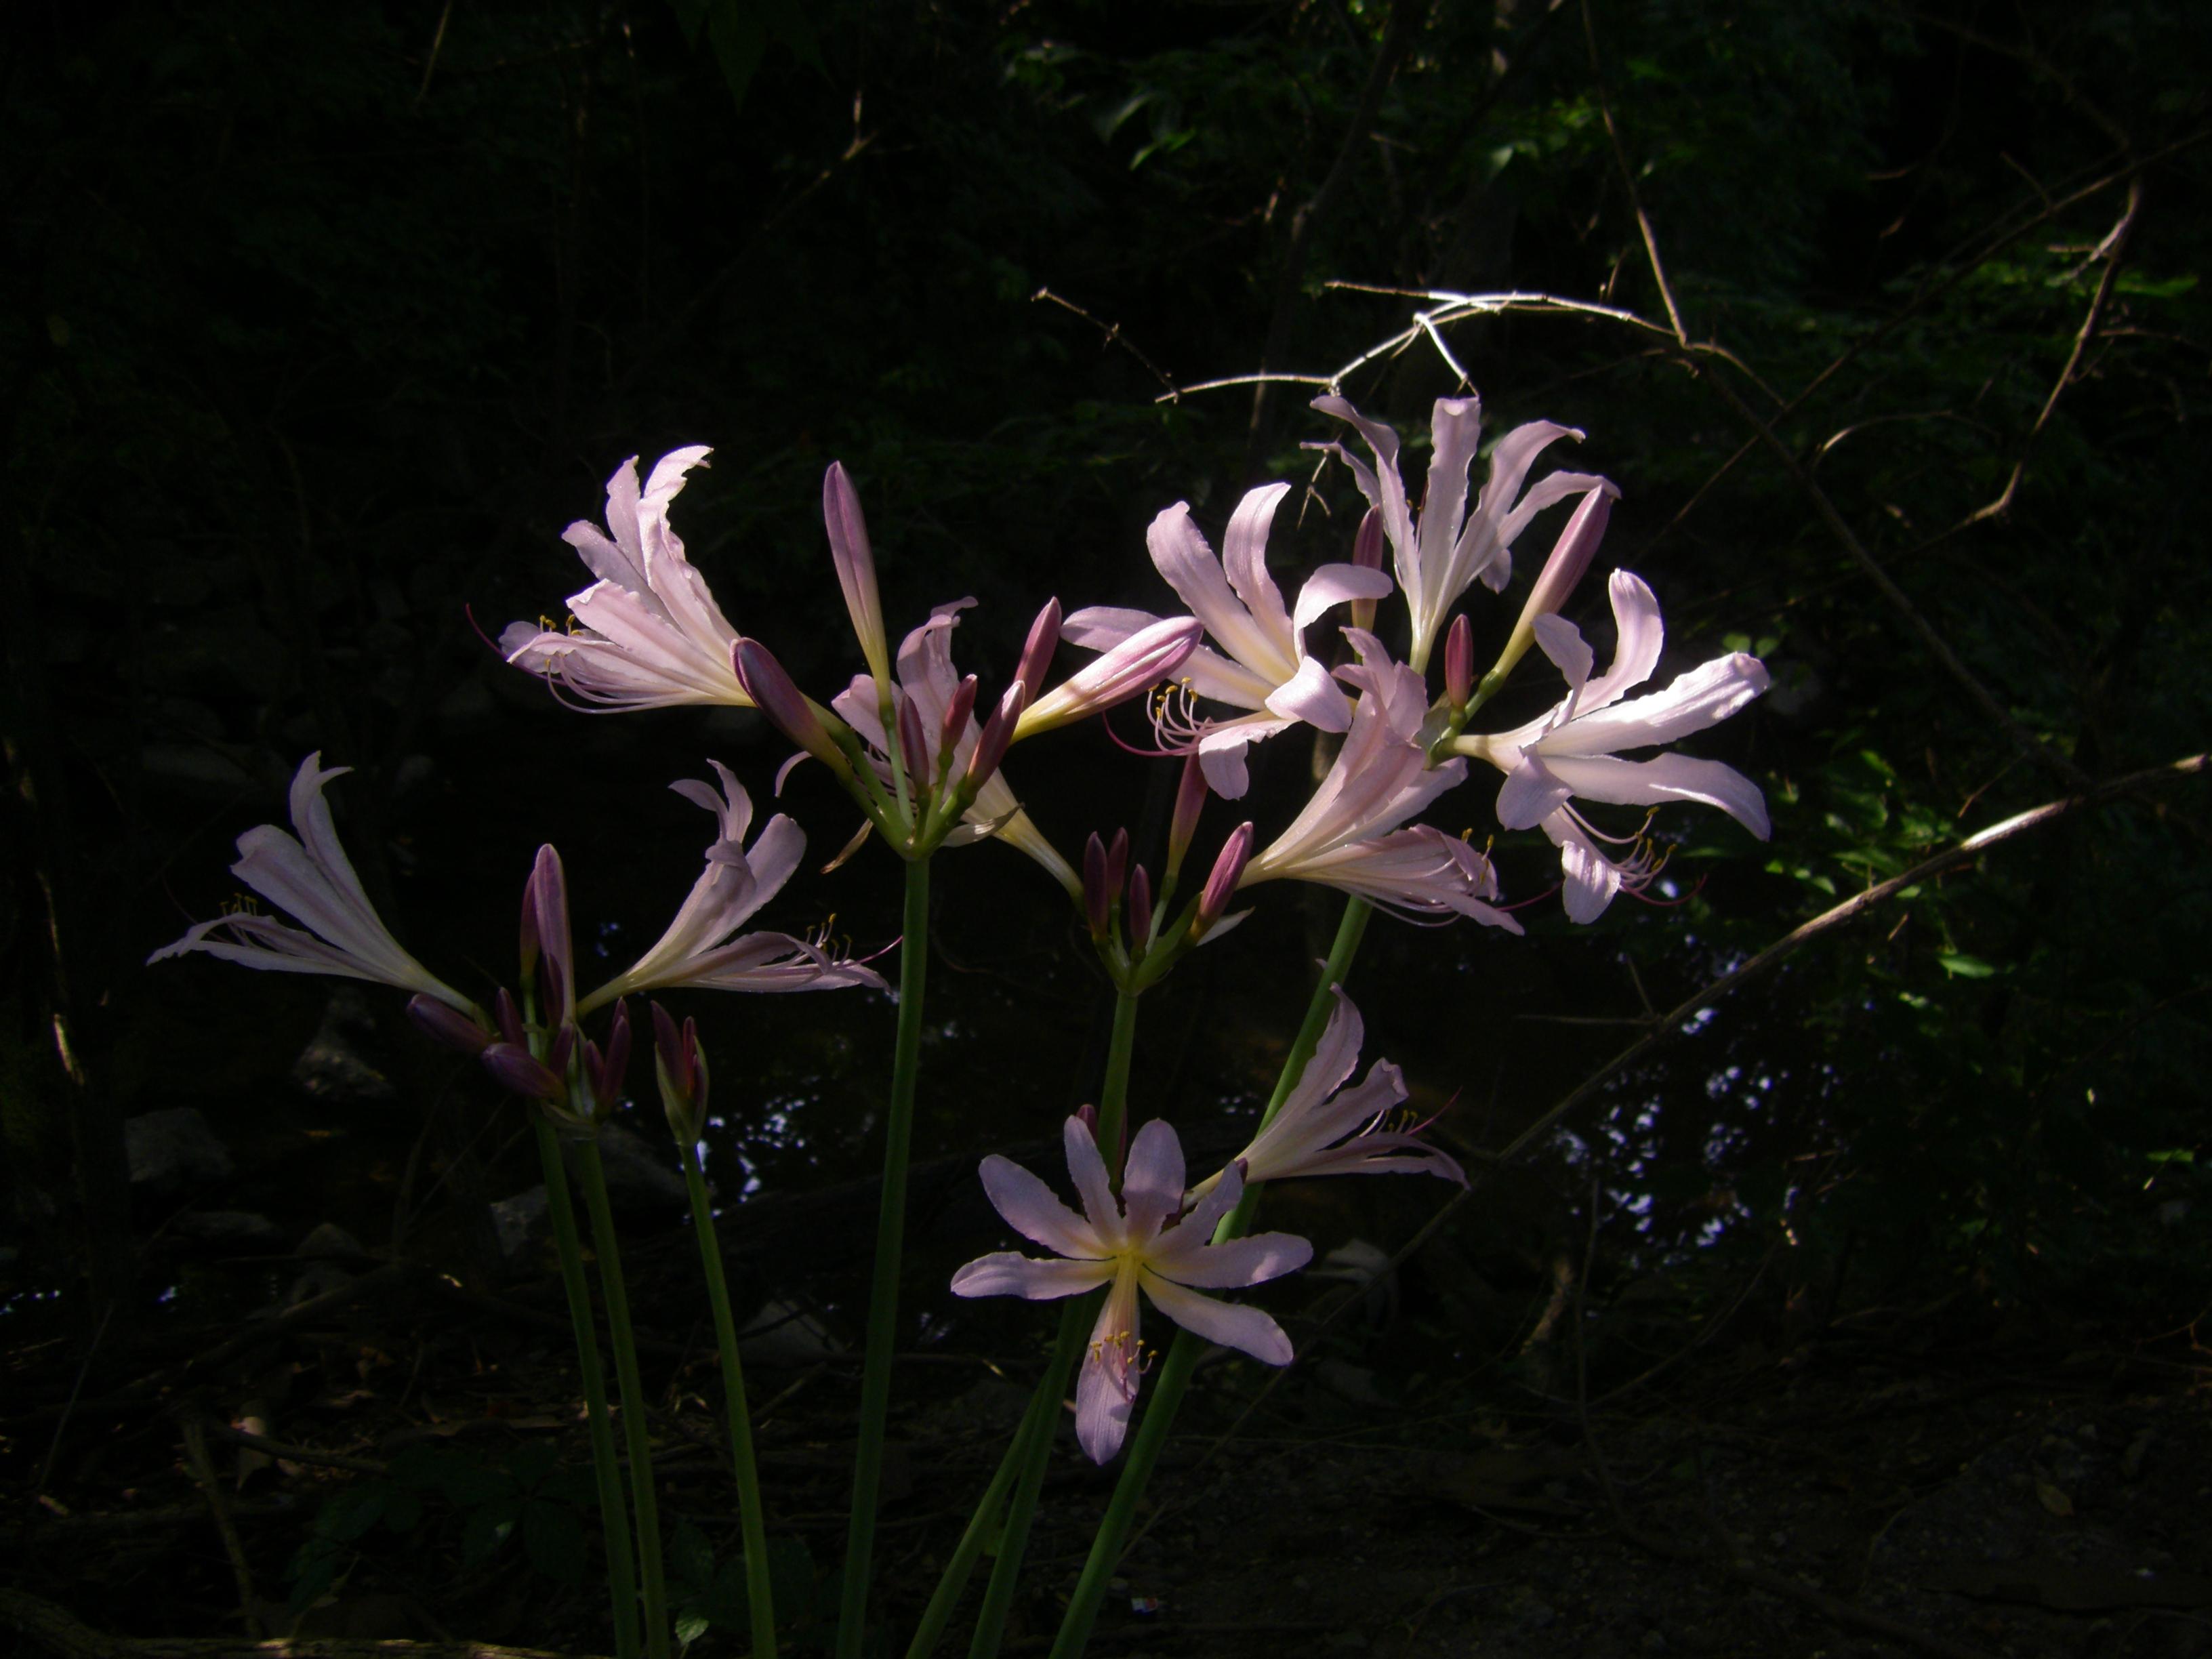 Filemagic lilies lycoris squamigera underexposed fill flash filemagic lilies lycoris squamigera underexposed fill flash indianapolis in usa 9 izmirmasajfo